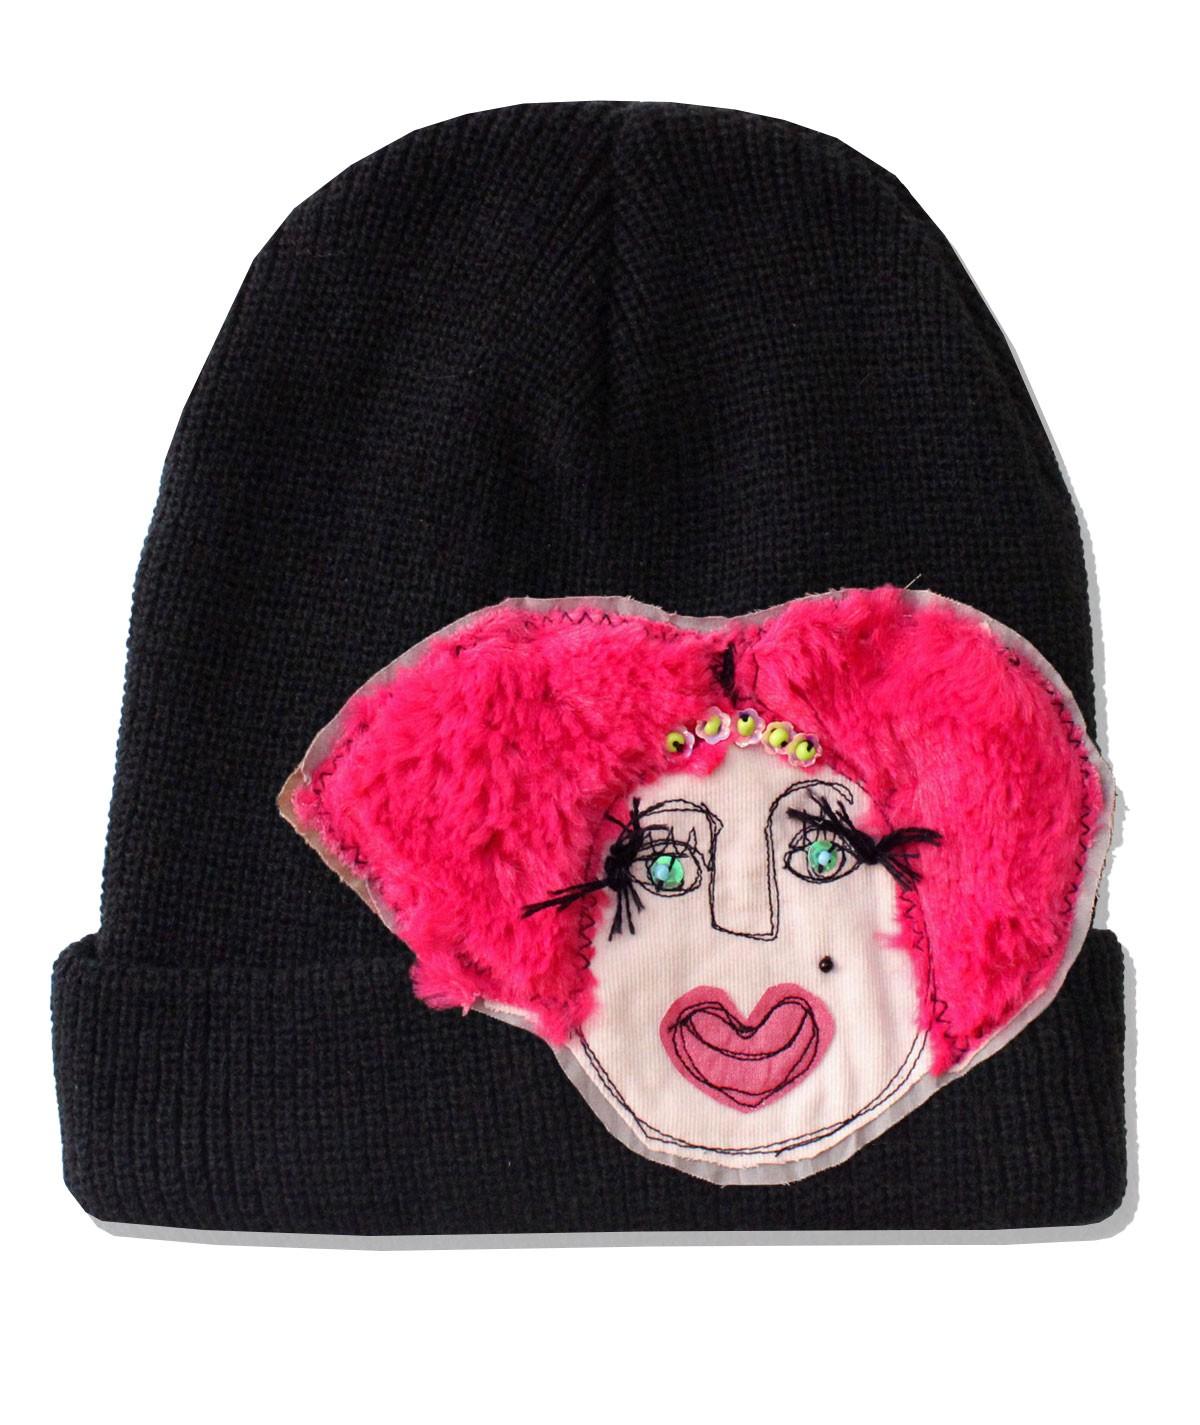 Emma - hat